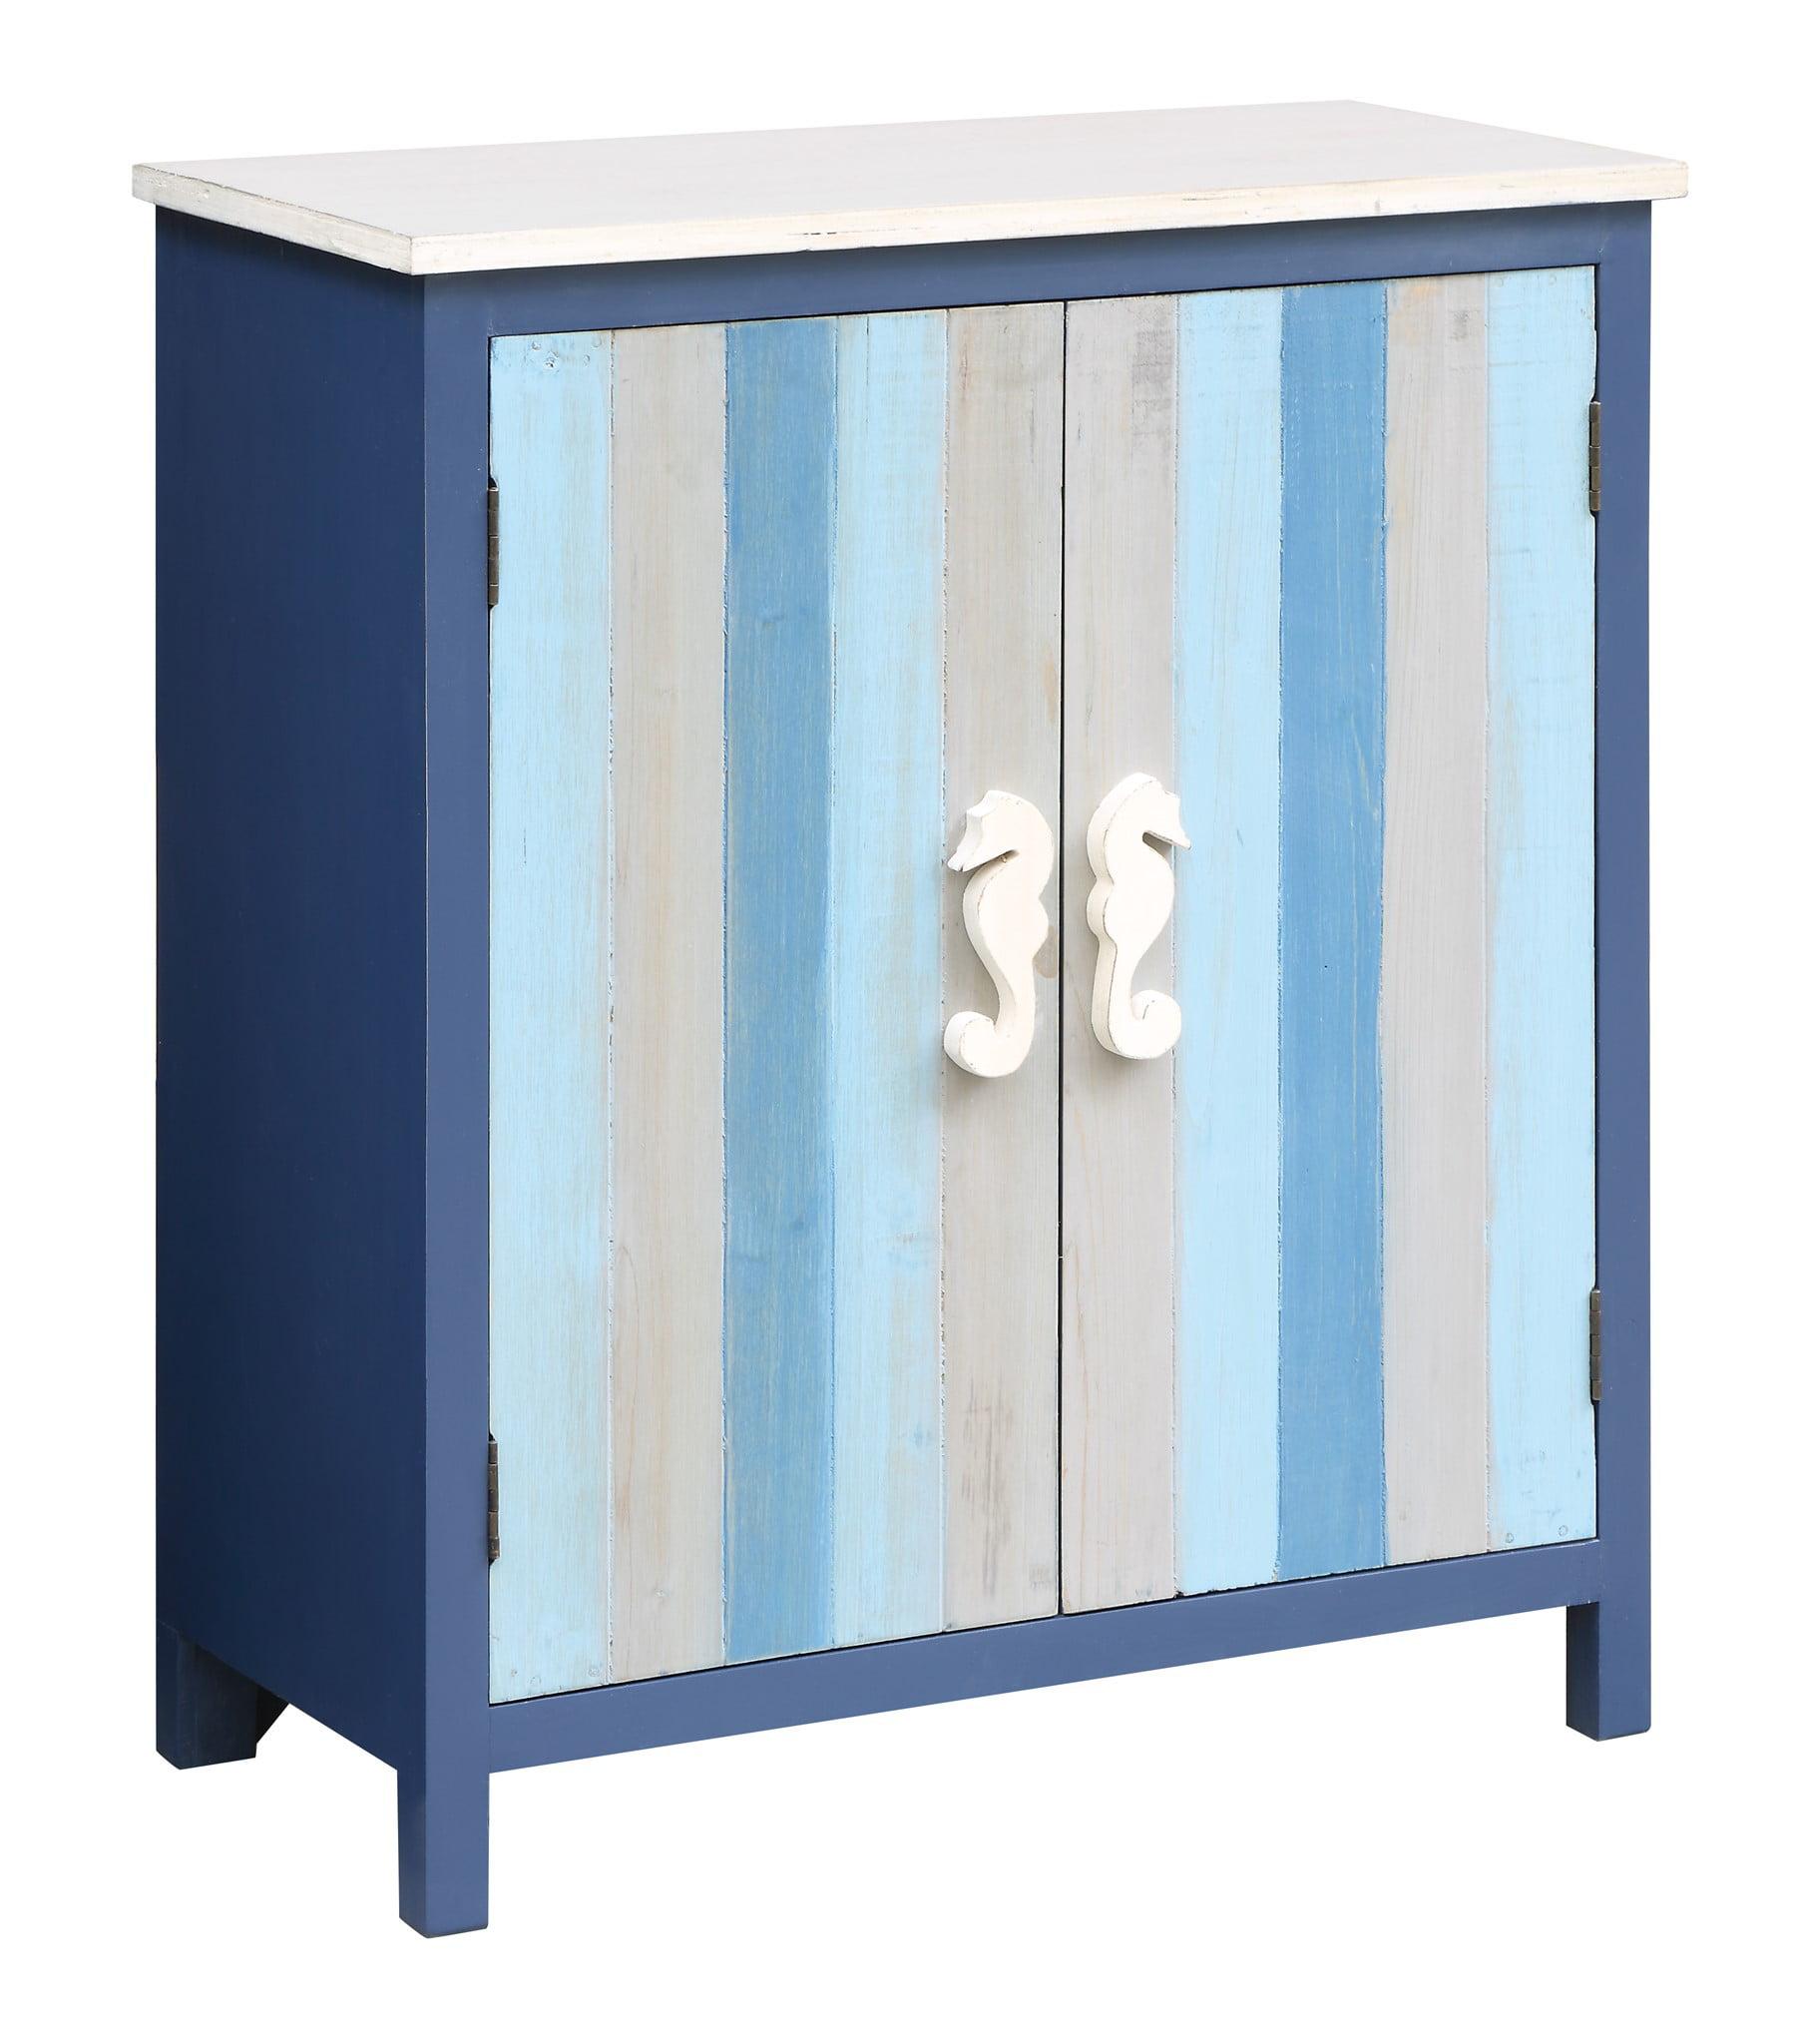 Nautical Blue And Grey Striped 2 Door Cabinet With Seahorse Hardware Walmart Com Walmart Com